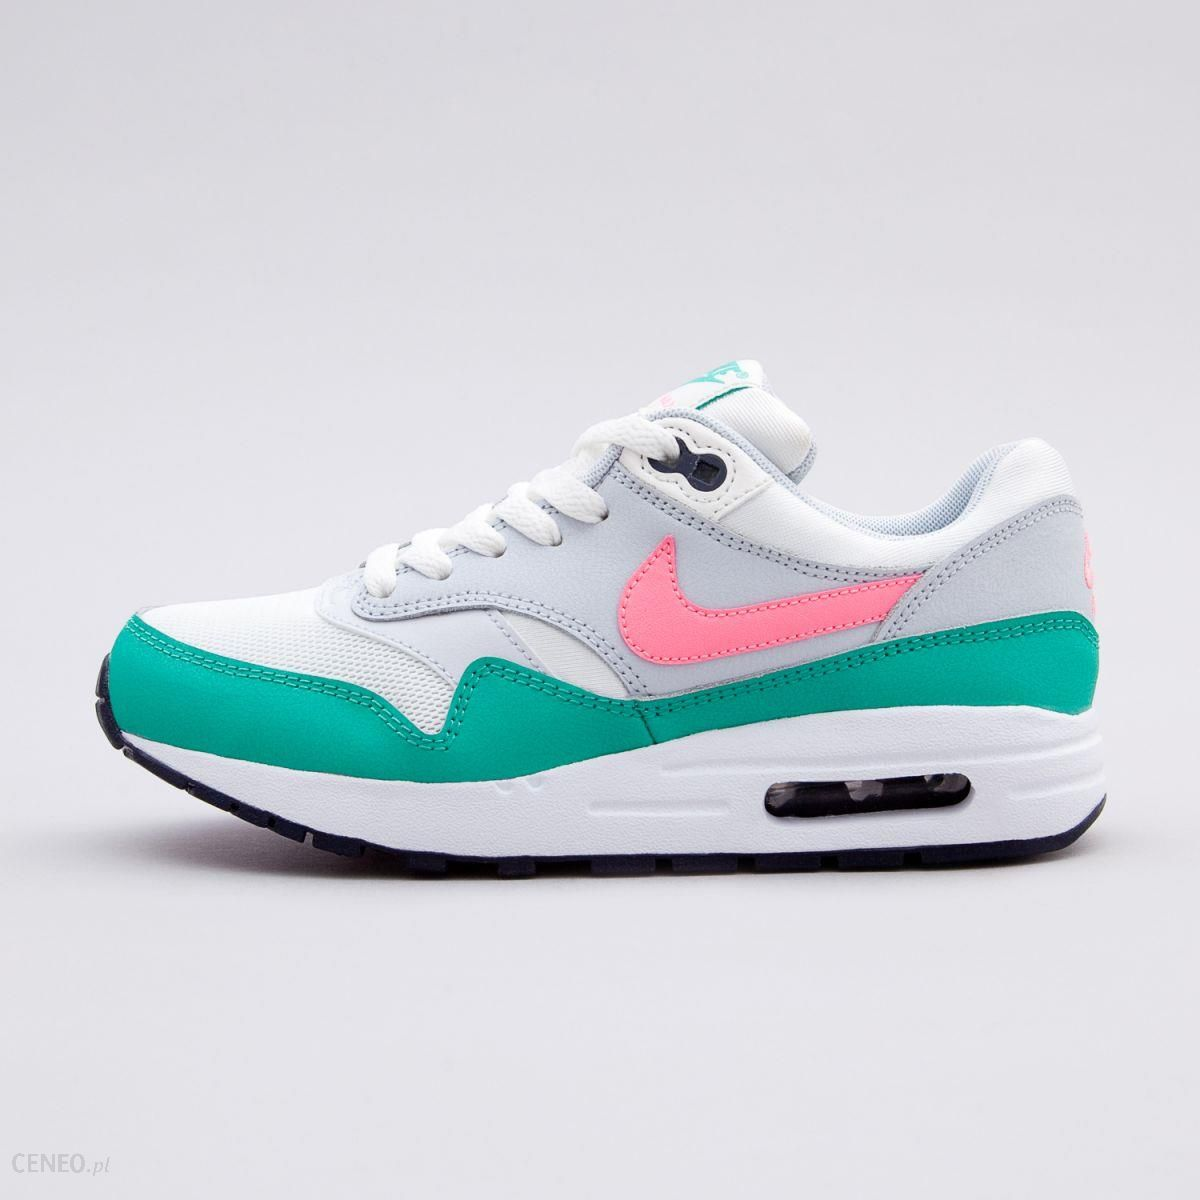 Nike AIR MAX 1 (GS) 807602 105 Ceny i opinie Ceneo.pl